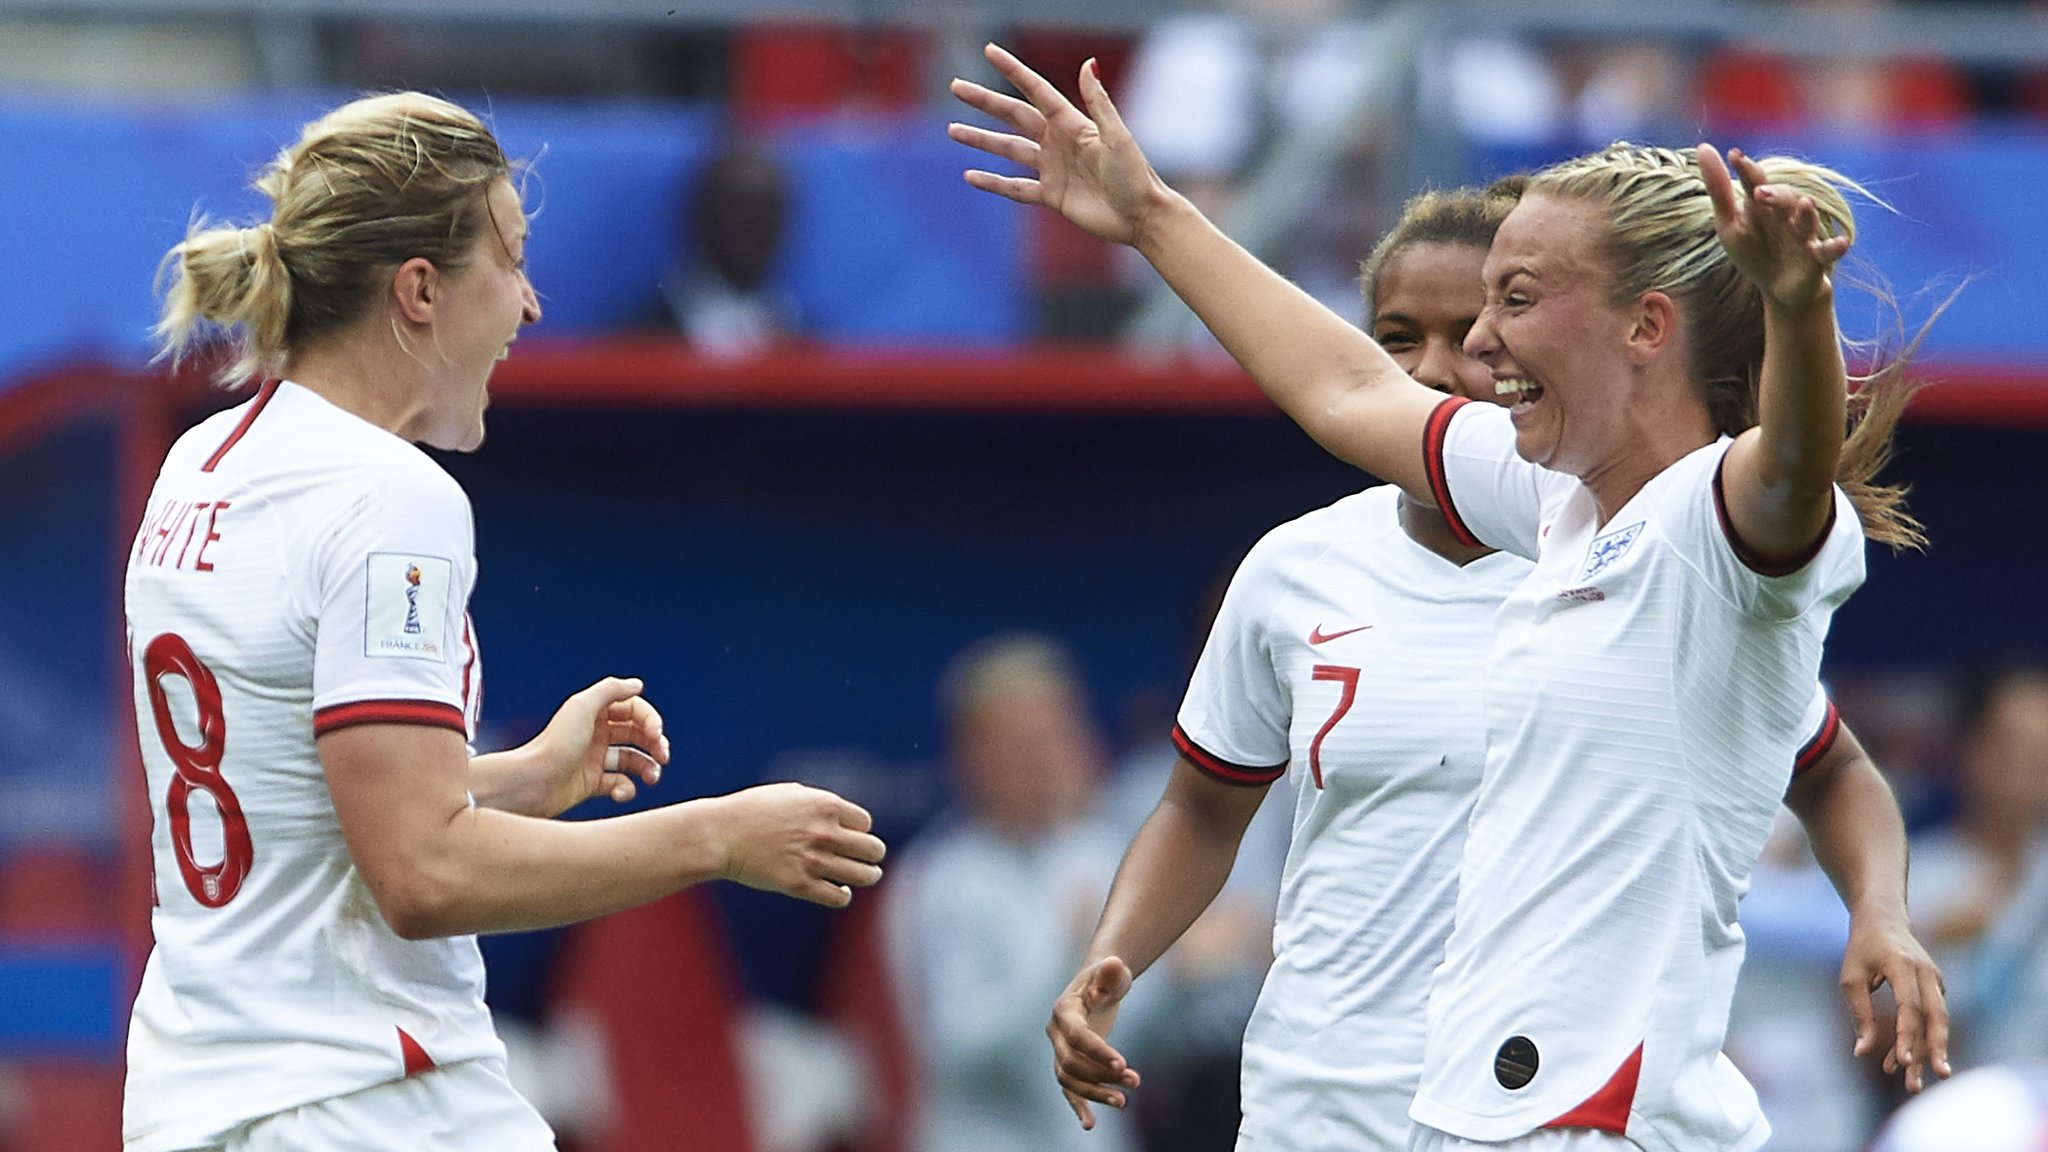 Women's World Cup: Record-breaking peak of 6.9m watch England beat Cameroon